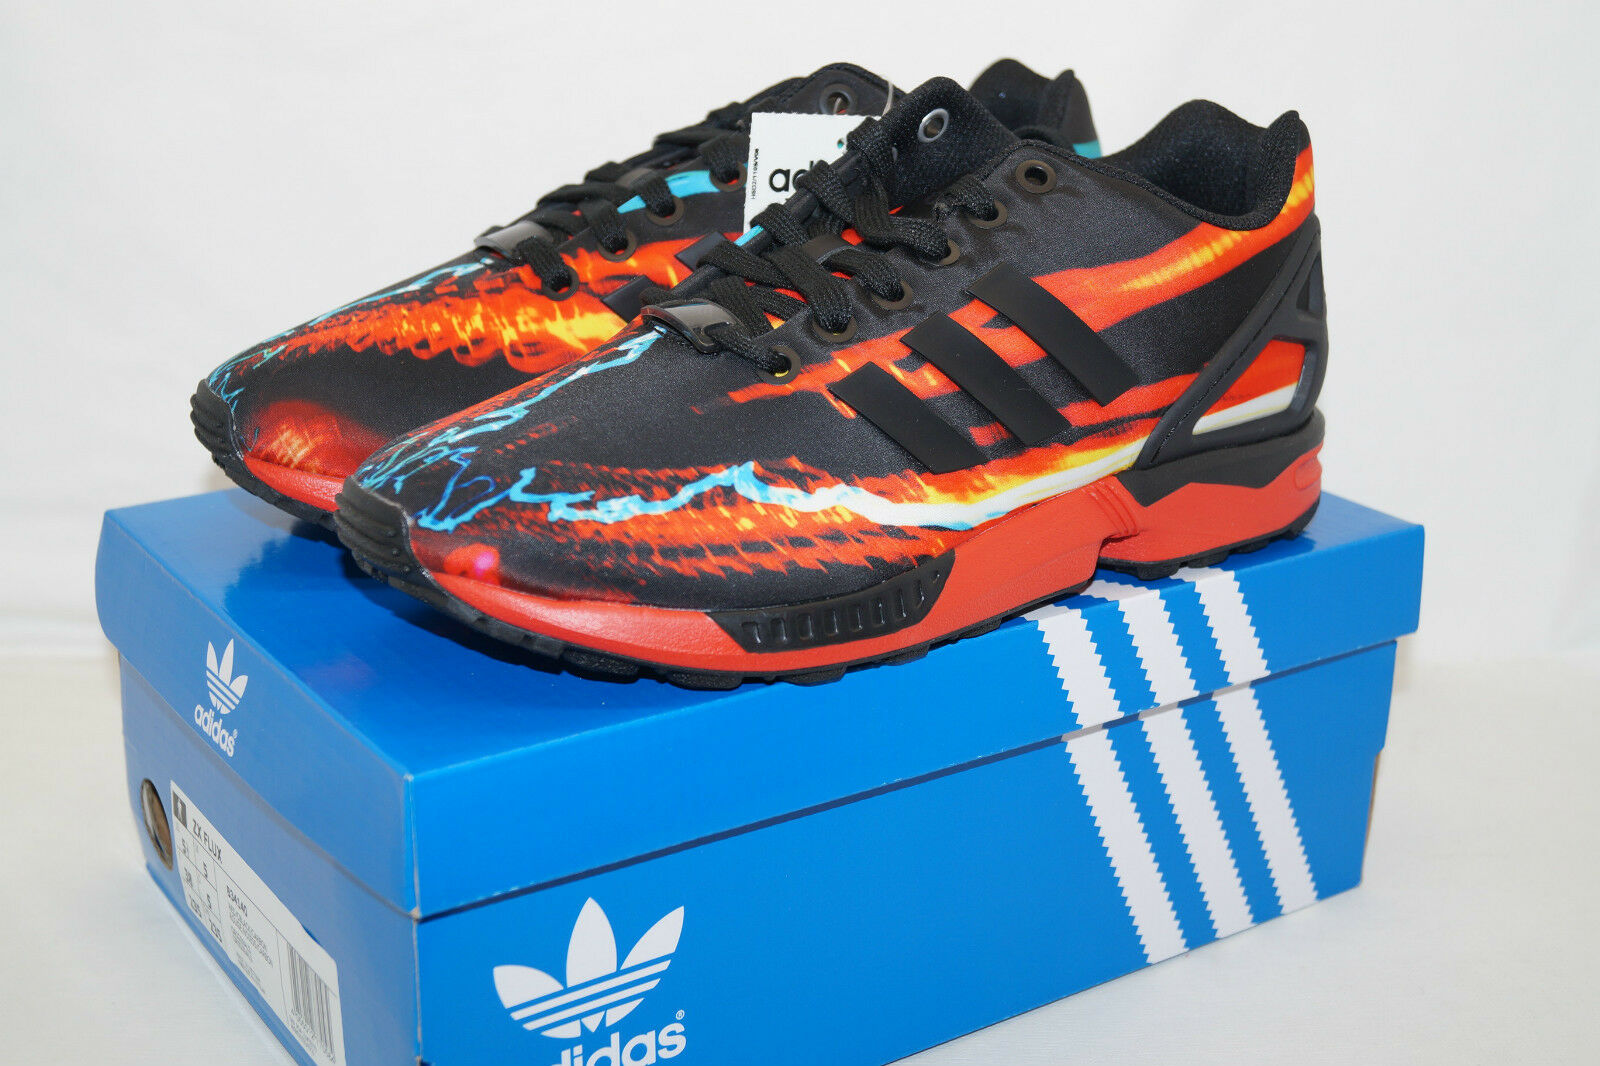 Adidas Originals Zx Flux Torsion Gr.38 UK 5 B34140 Running Jogging Walking Gym